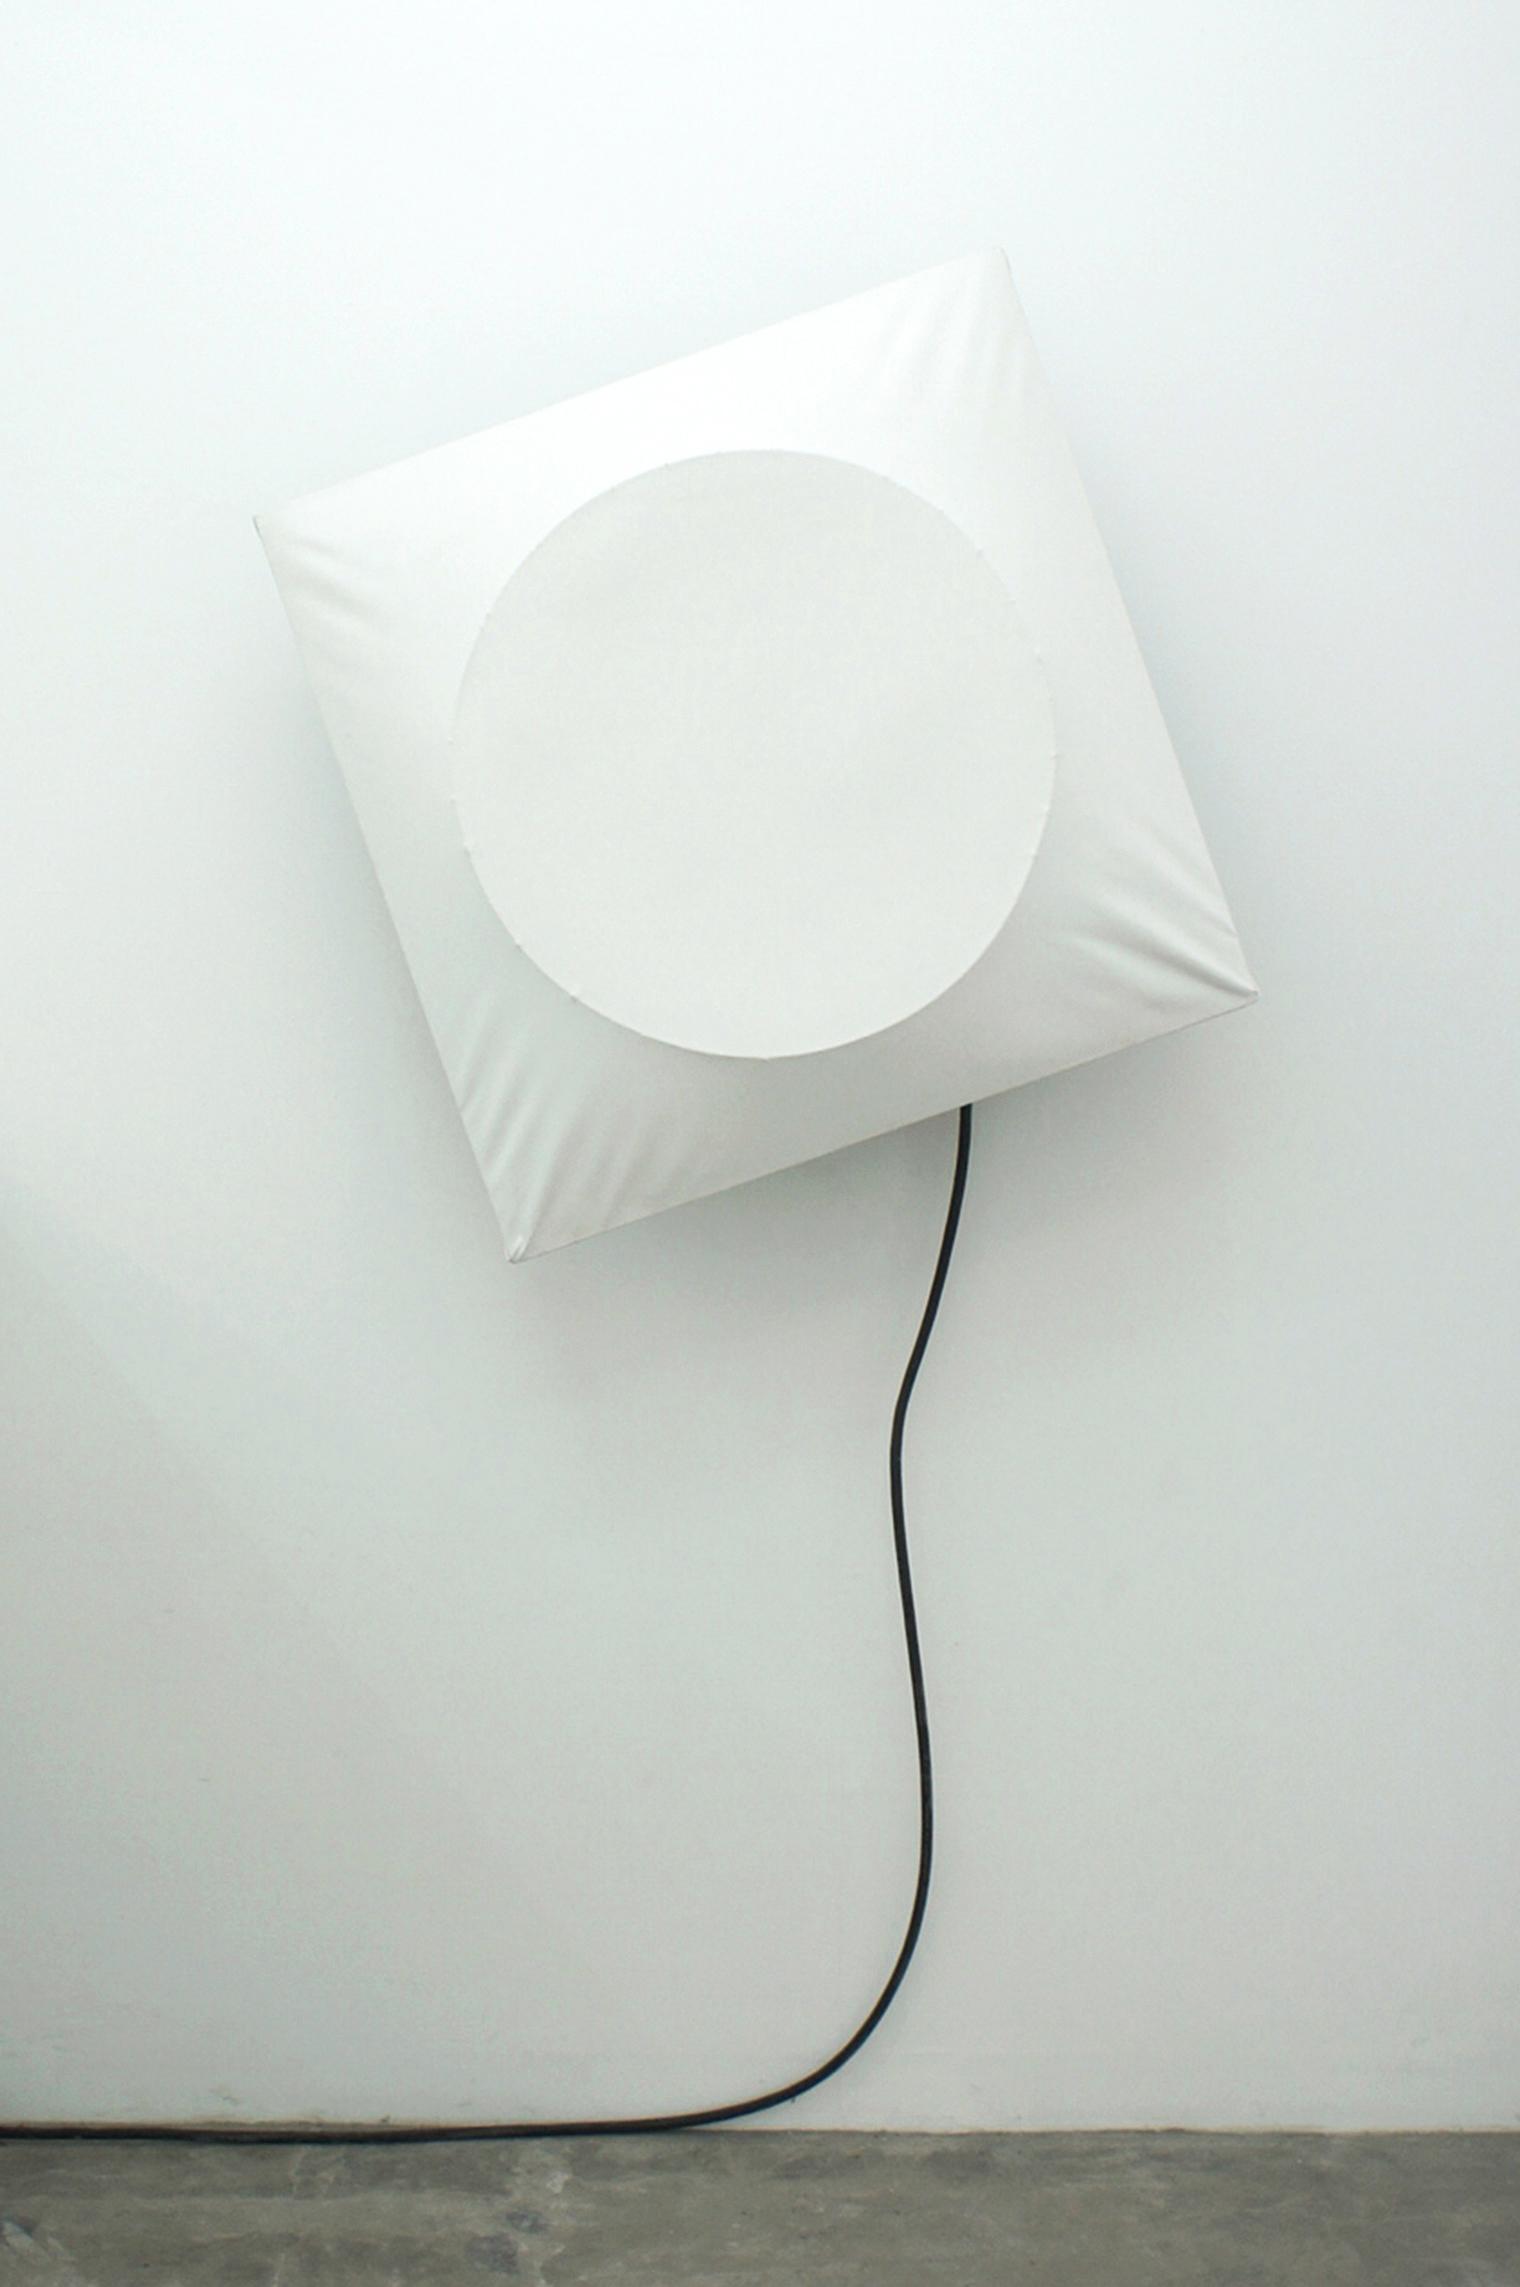 Poklong Anading  untitled, 2006/2017 canvas, exhaust fan, wood, metal 84.5 x 84.5 x 38 cm / 33.3 x 33.3 x 15 in / 2.8 x 2.8 x1.3 ft